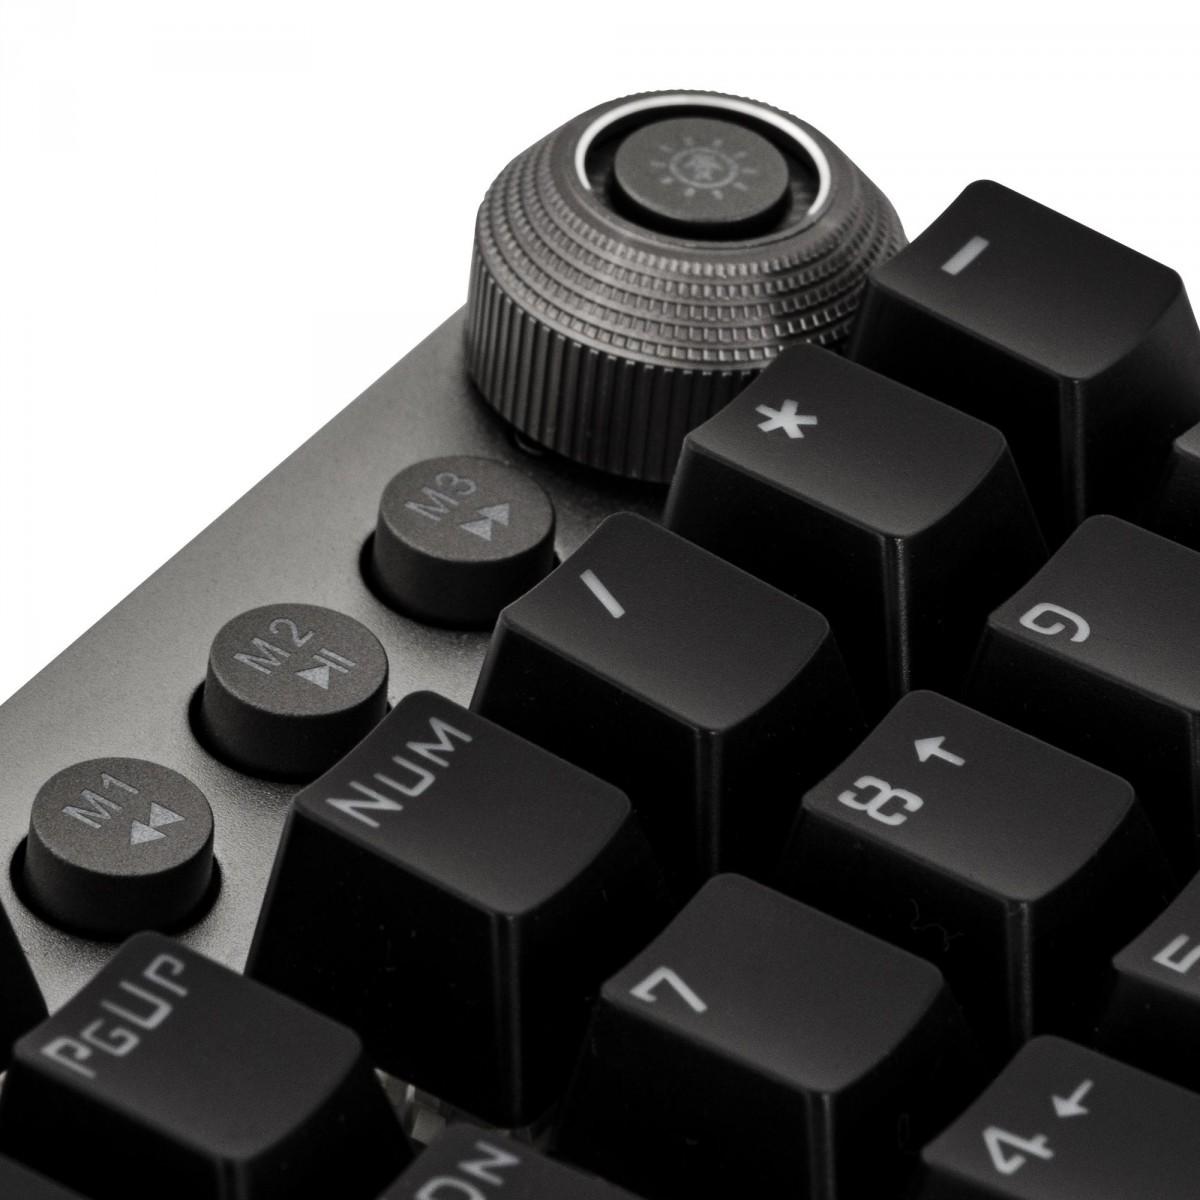 Teclado Gamer Mecânico Fortrek K7 GPRO, RGB, Switch Blue, ABNT2, Preto, 67703